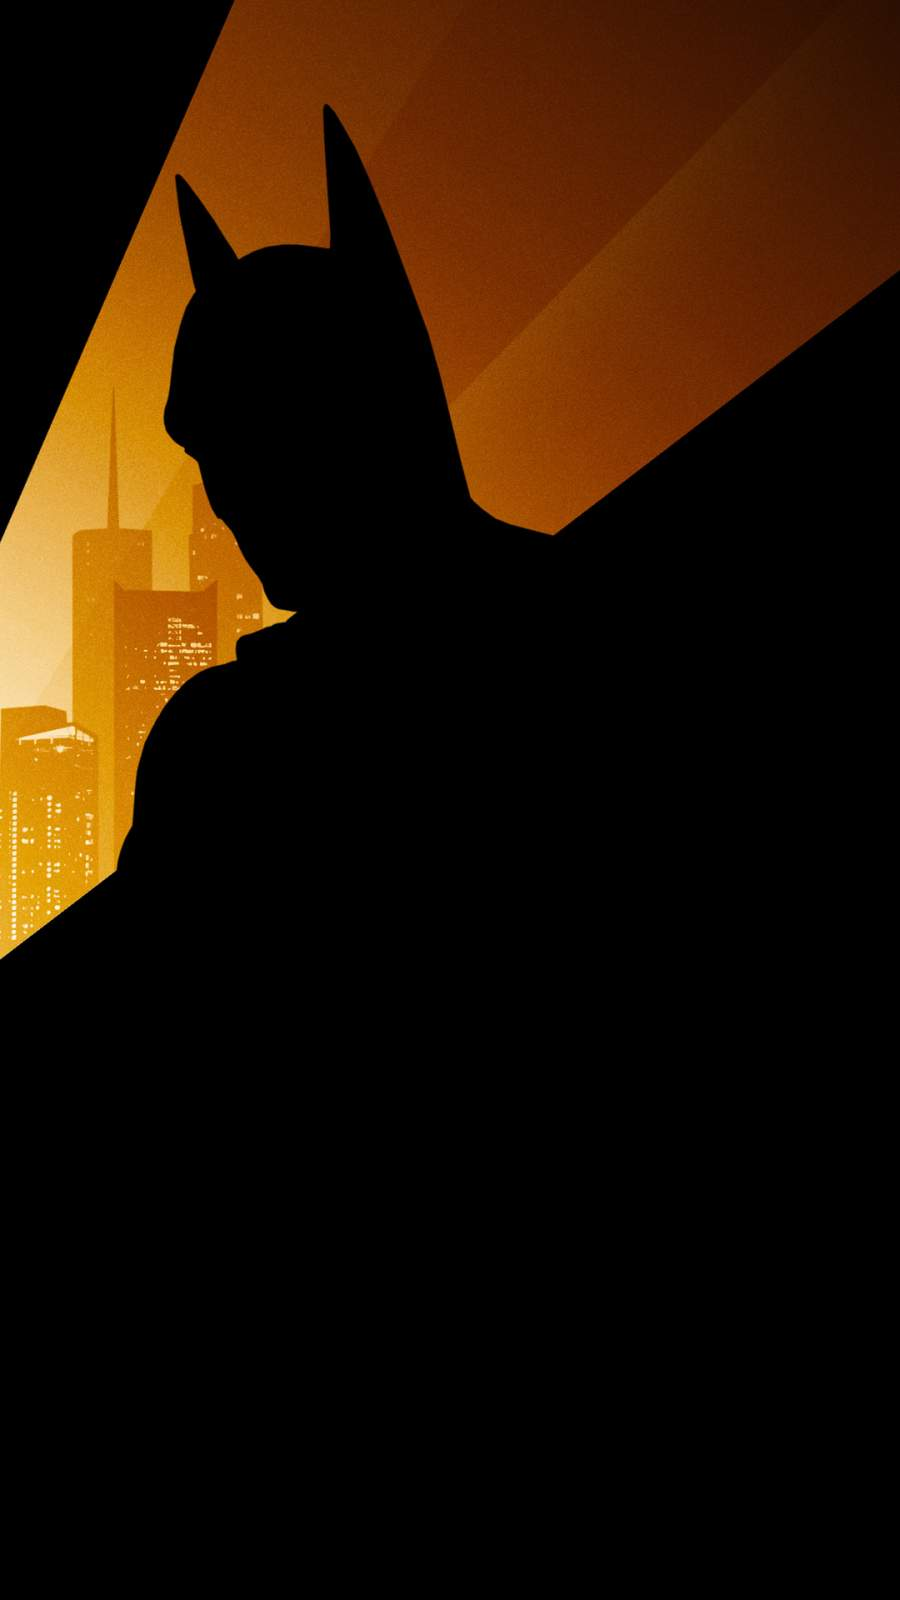 Batman Silhouette iPhone Wallpaper